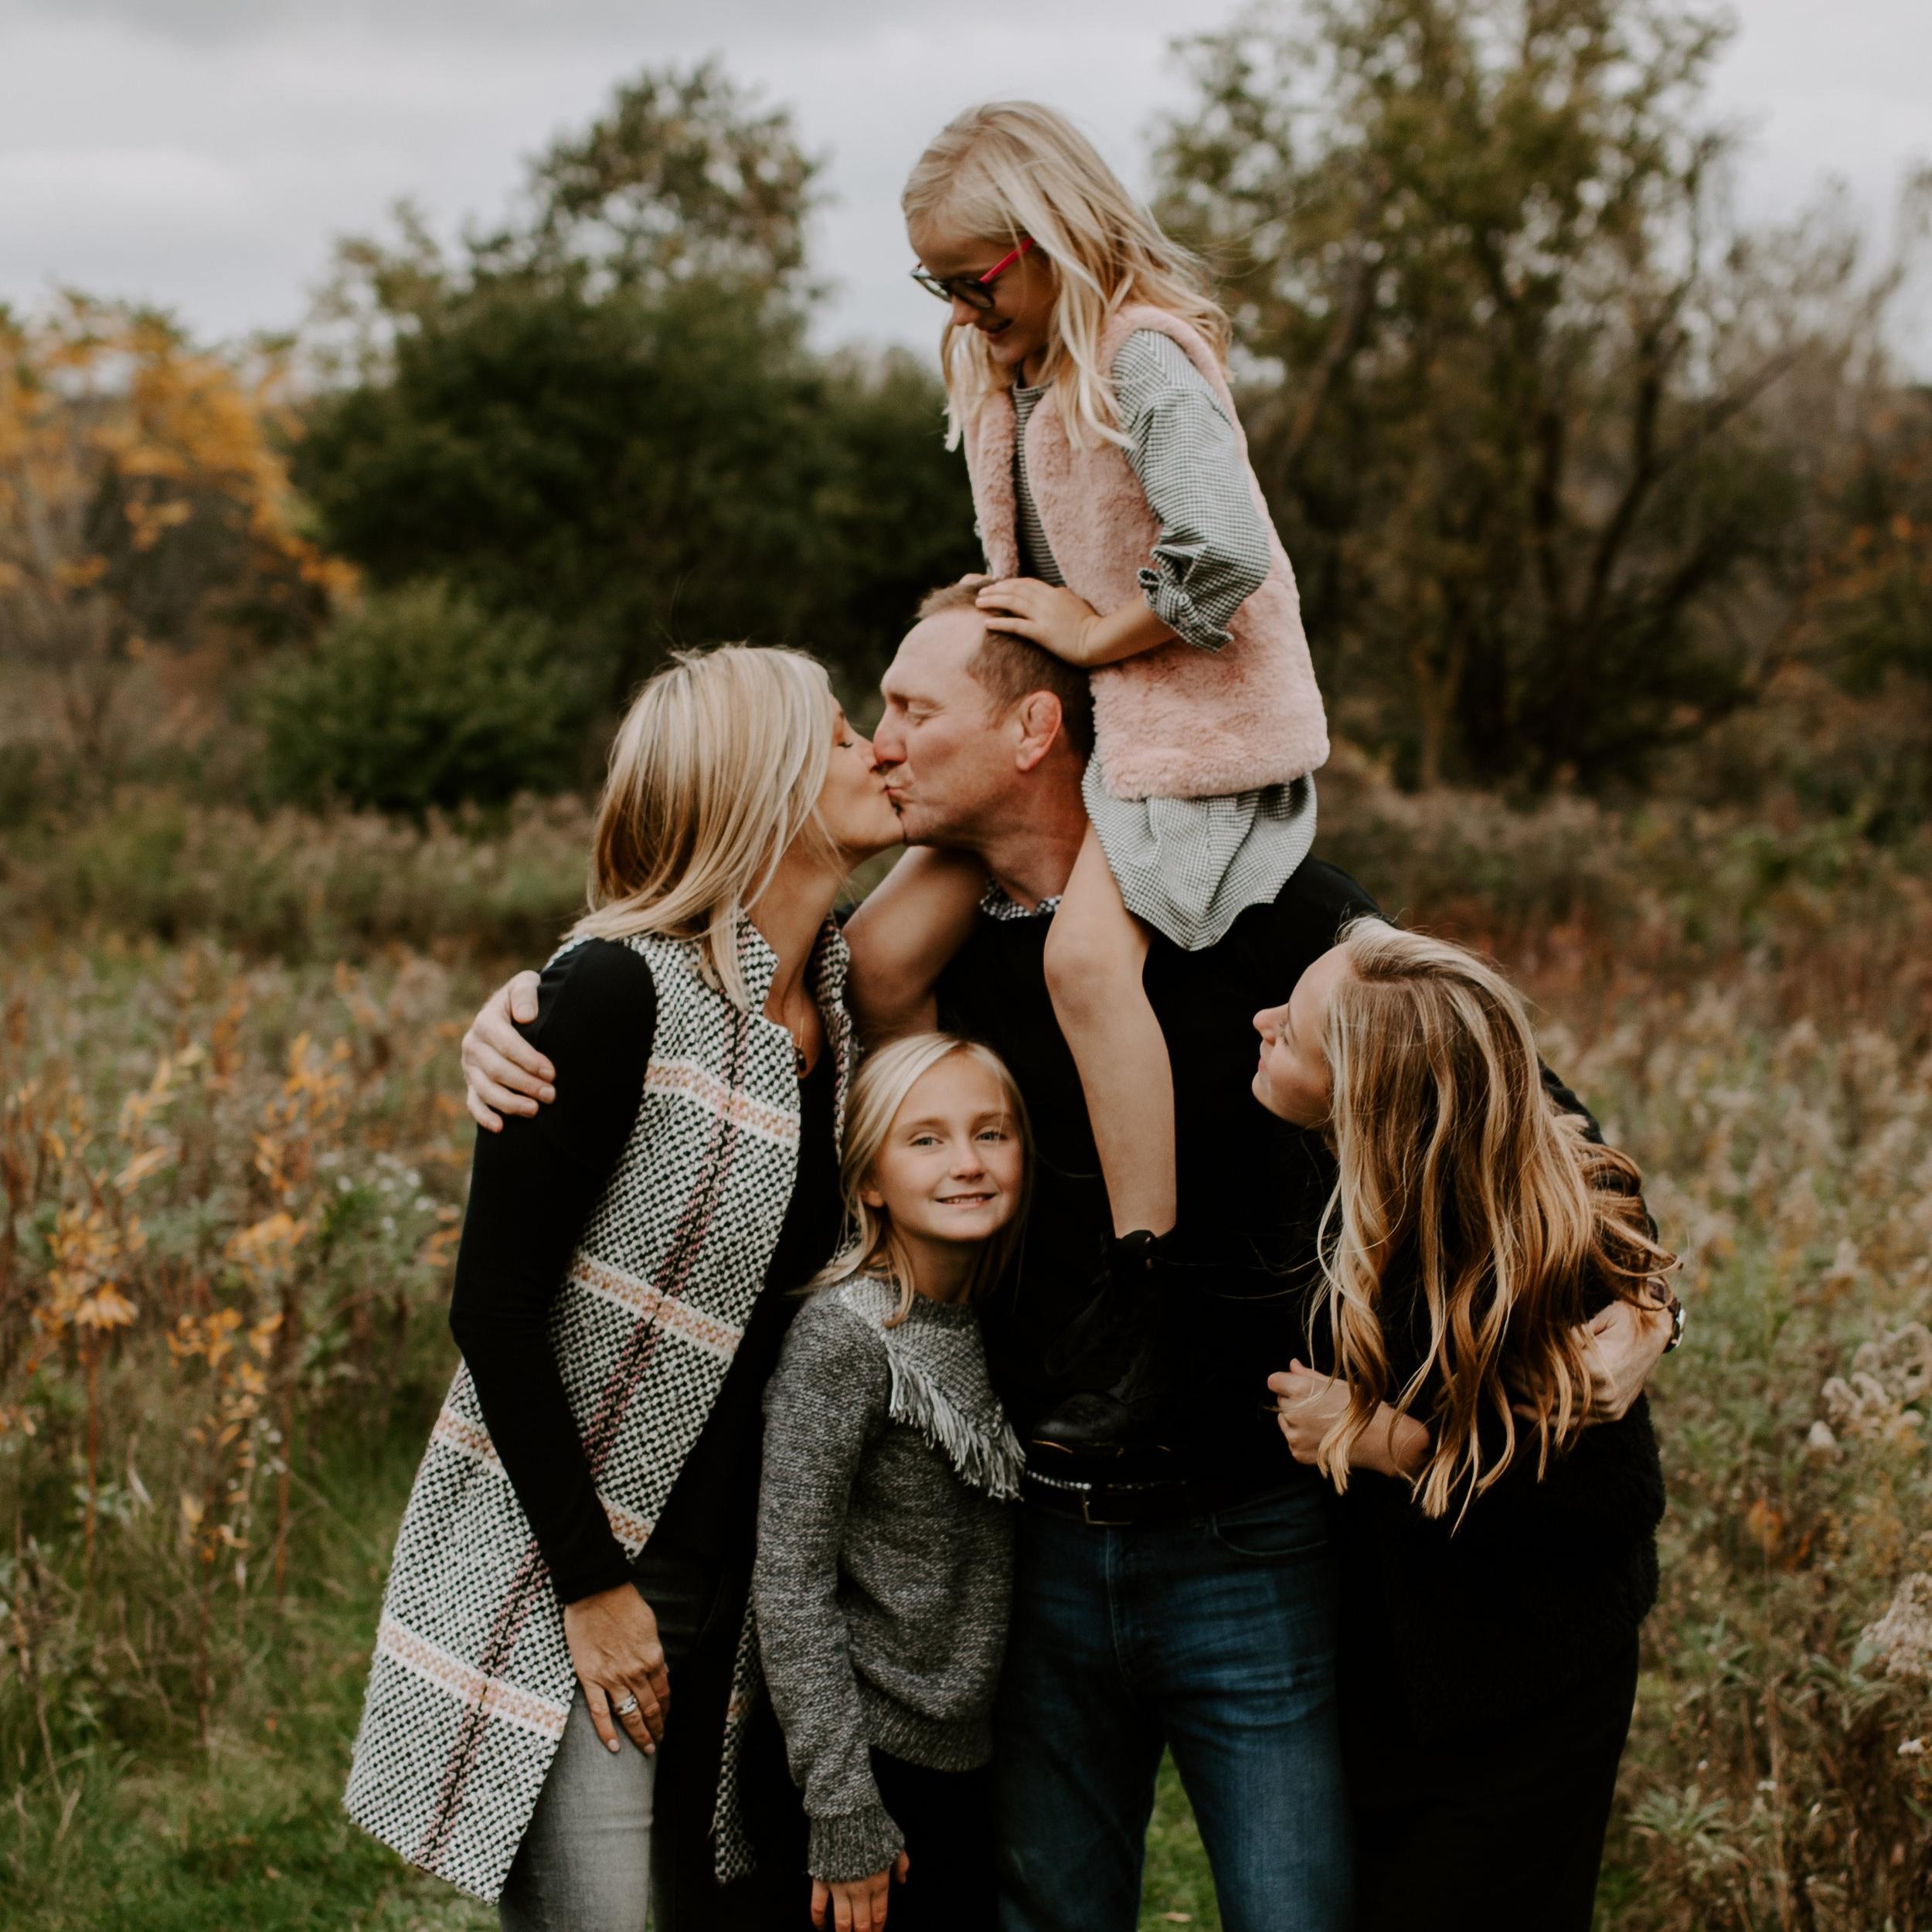 Fischer Farm Family Photo by Kerri Carlquist Photography